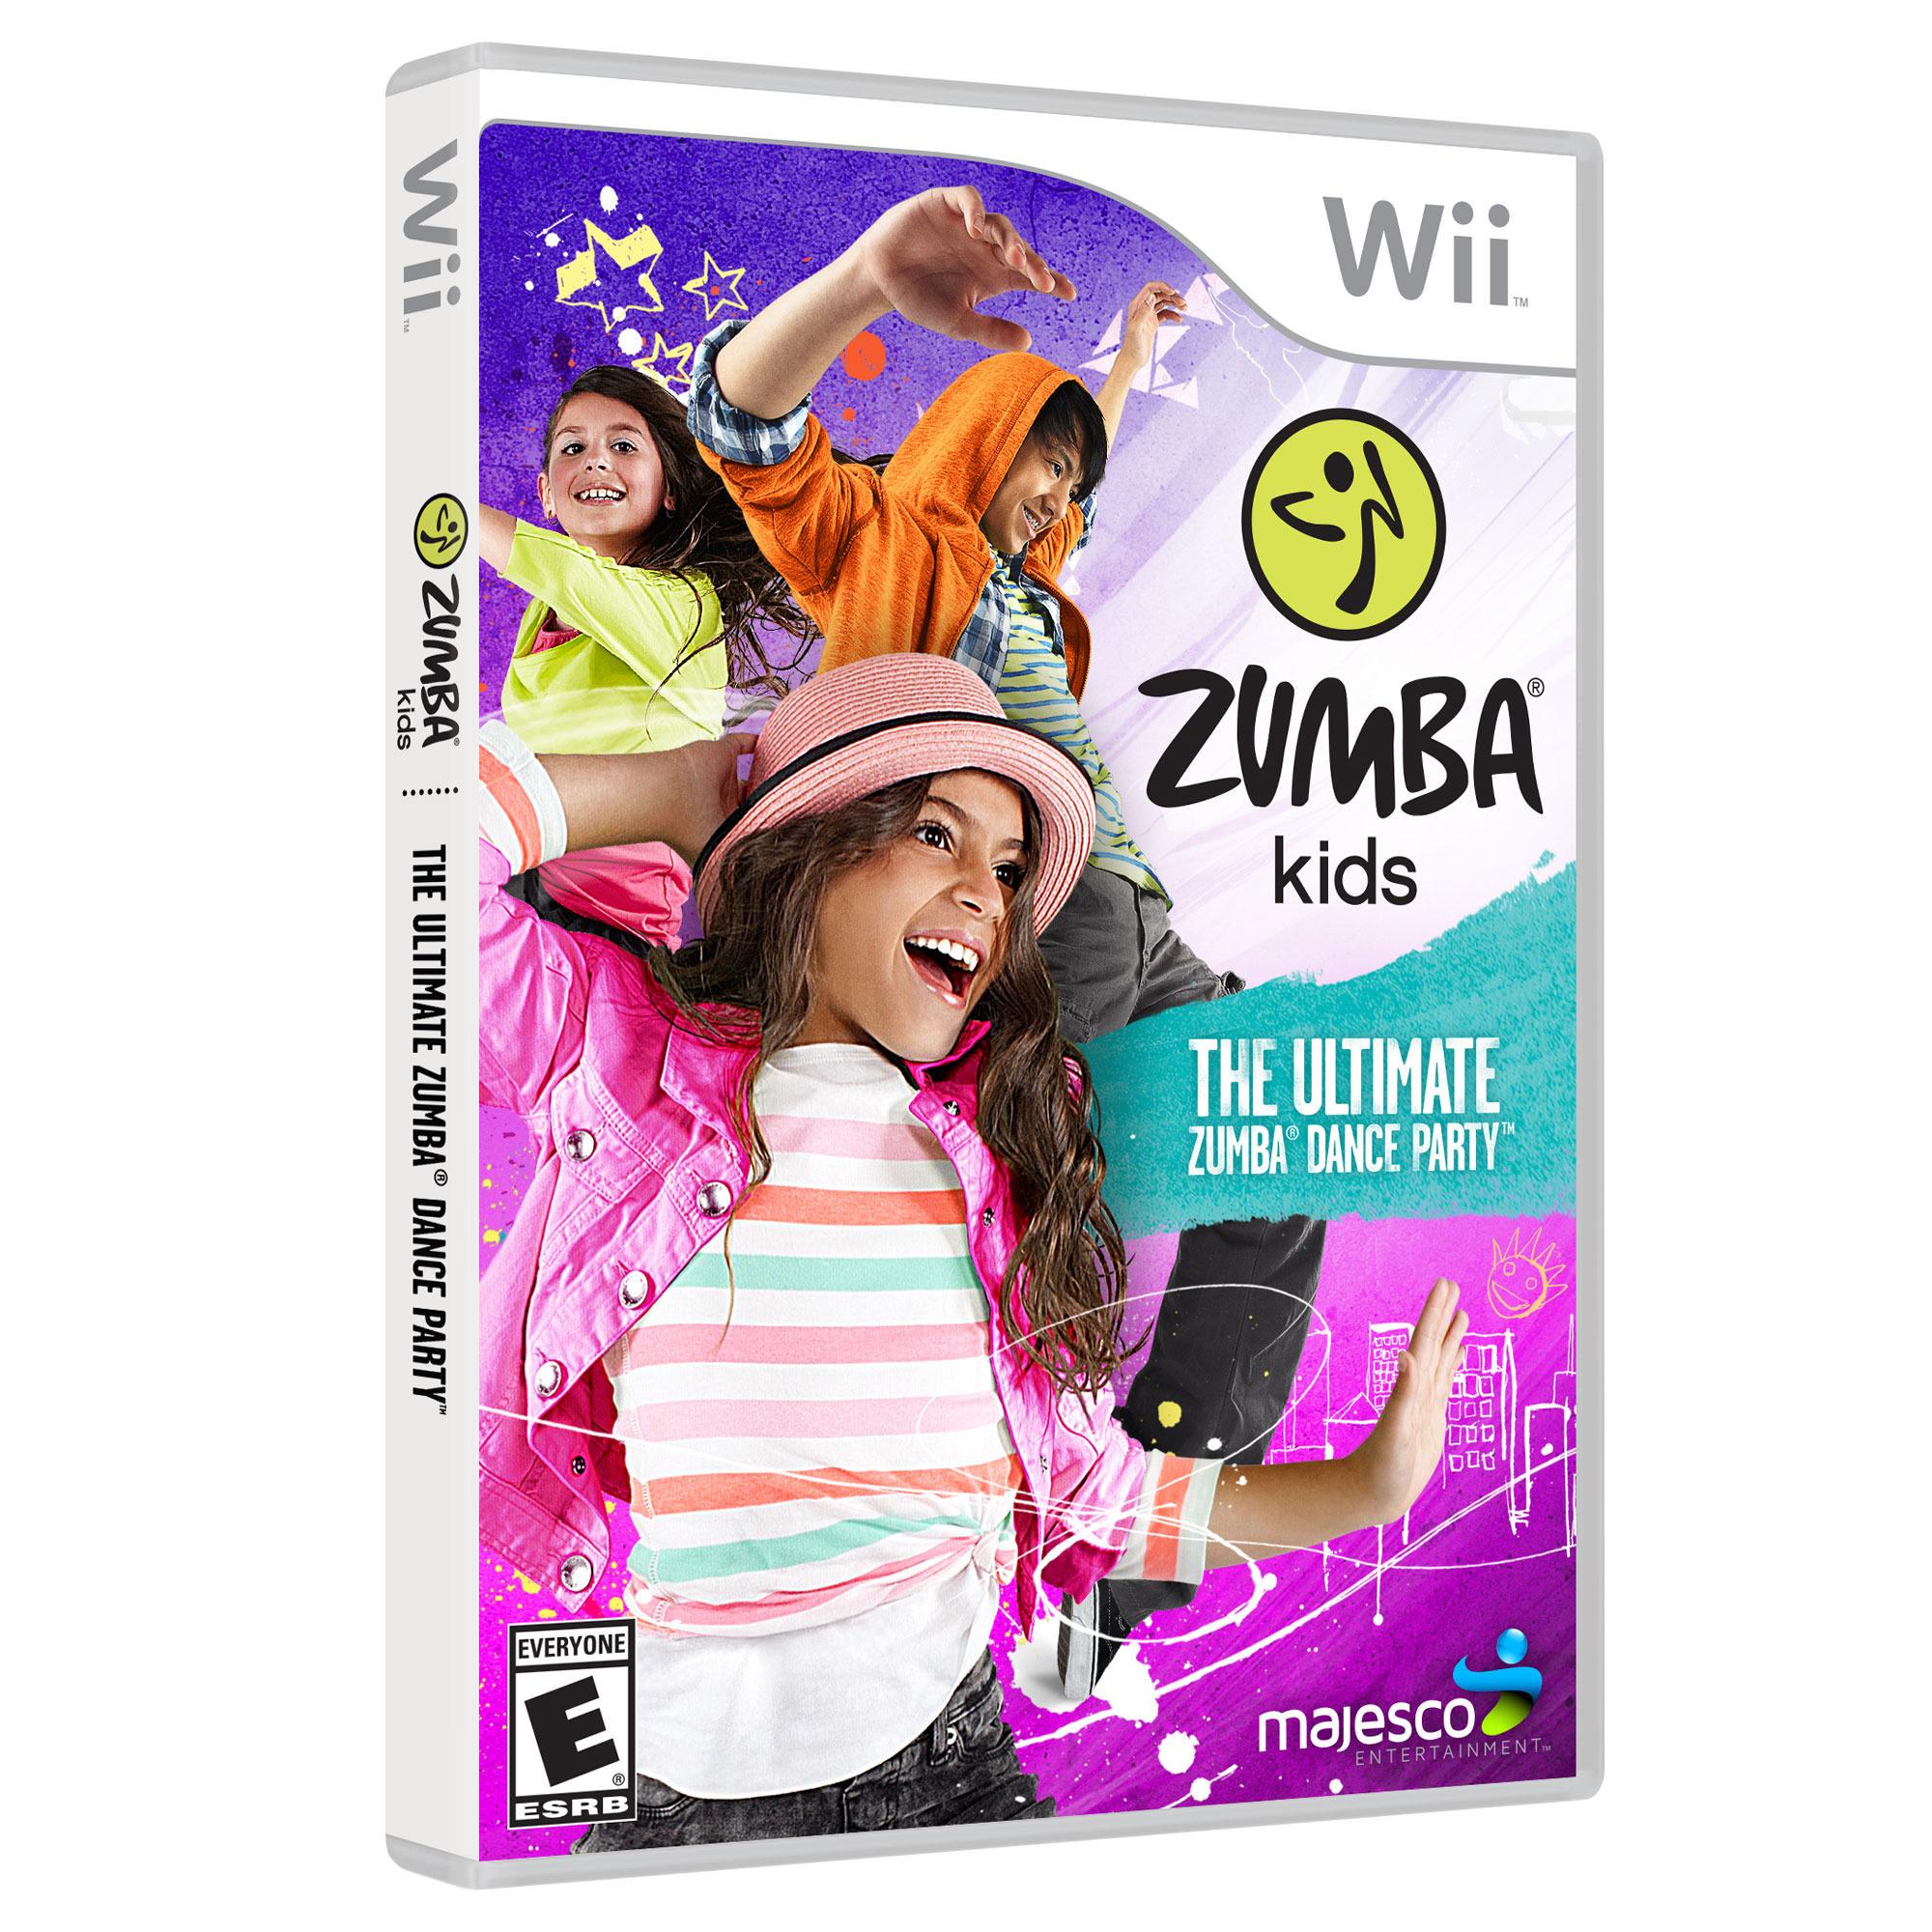 Zumba Kids The Ultimate Zumba Dance Party [MULTI5][PAL][UPLOADER] 1-a0p00201